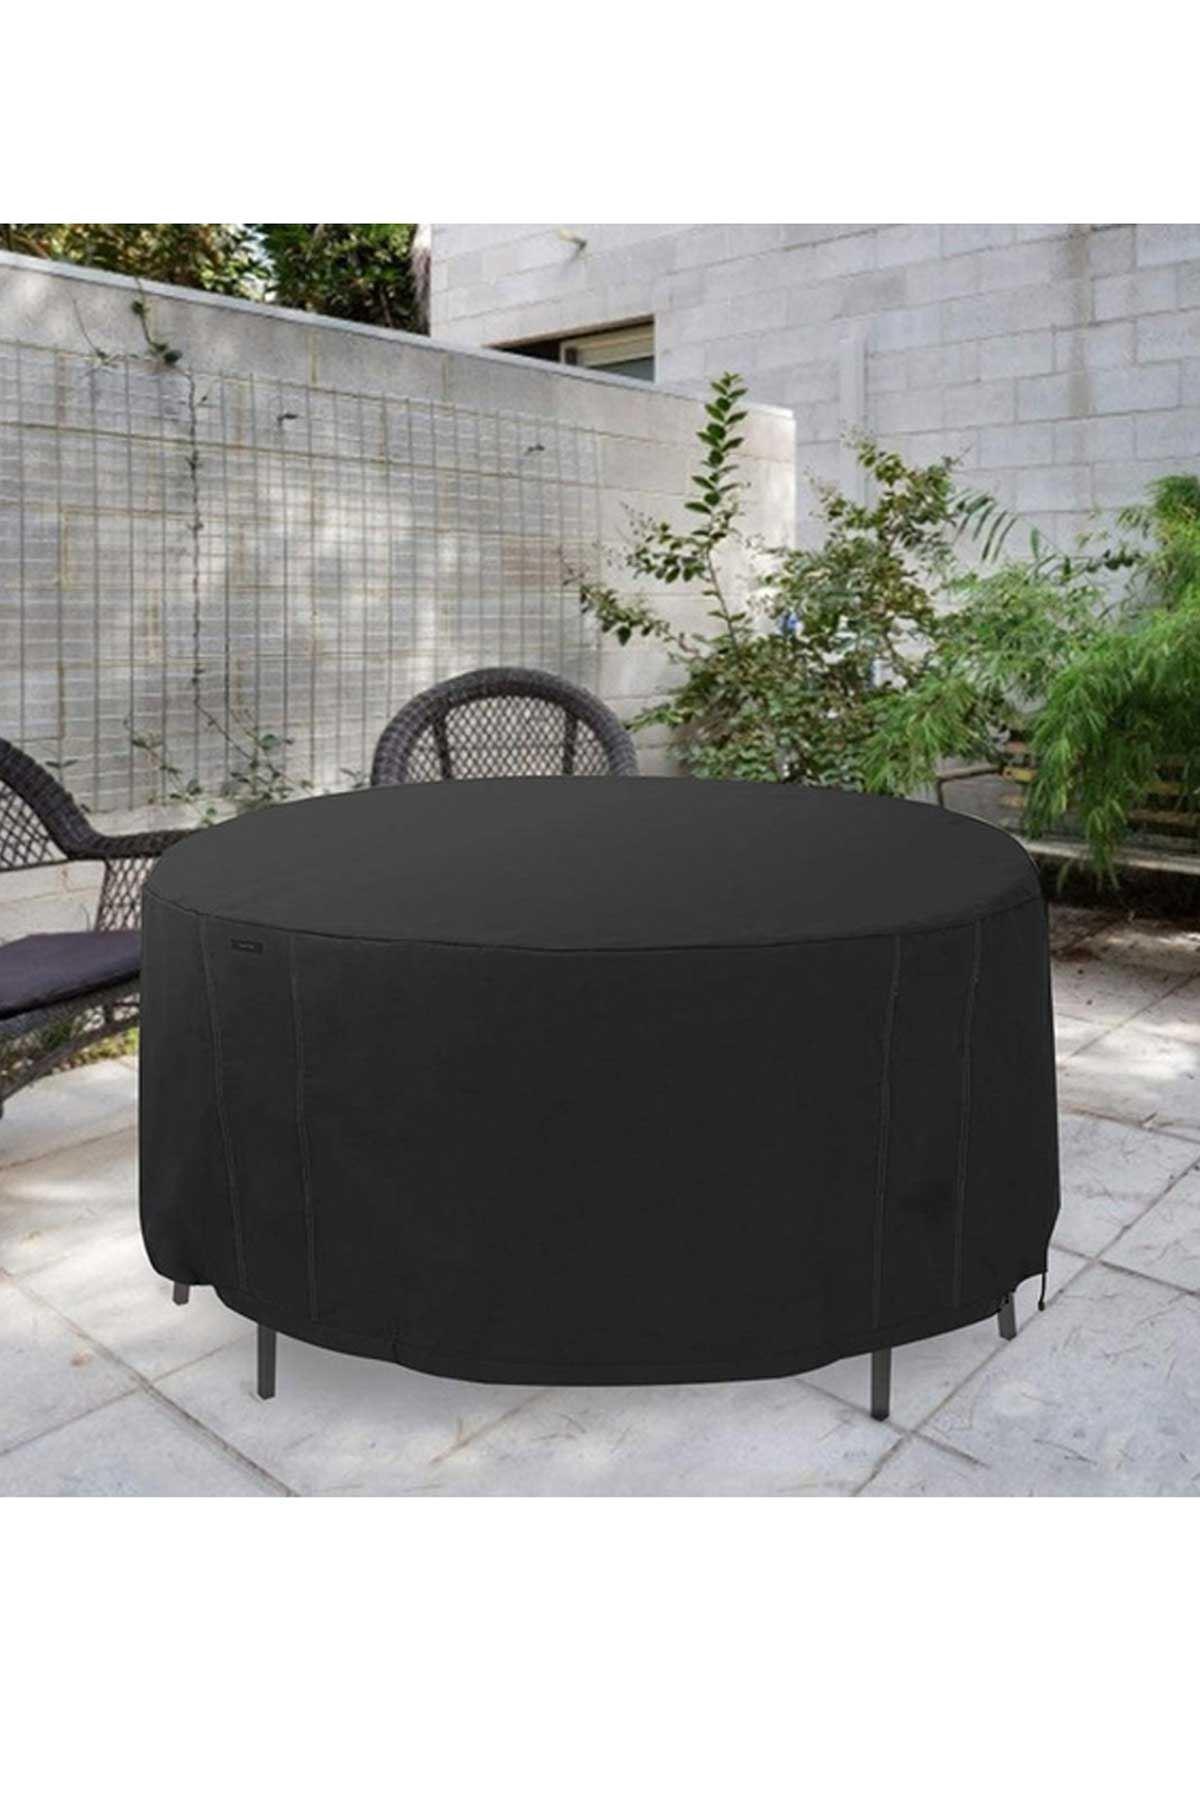 Siyah Bundera Guise Bahçe Mobilye Örtüsü